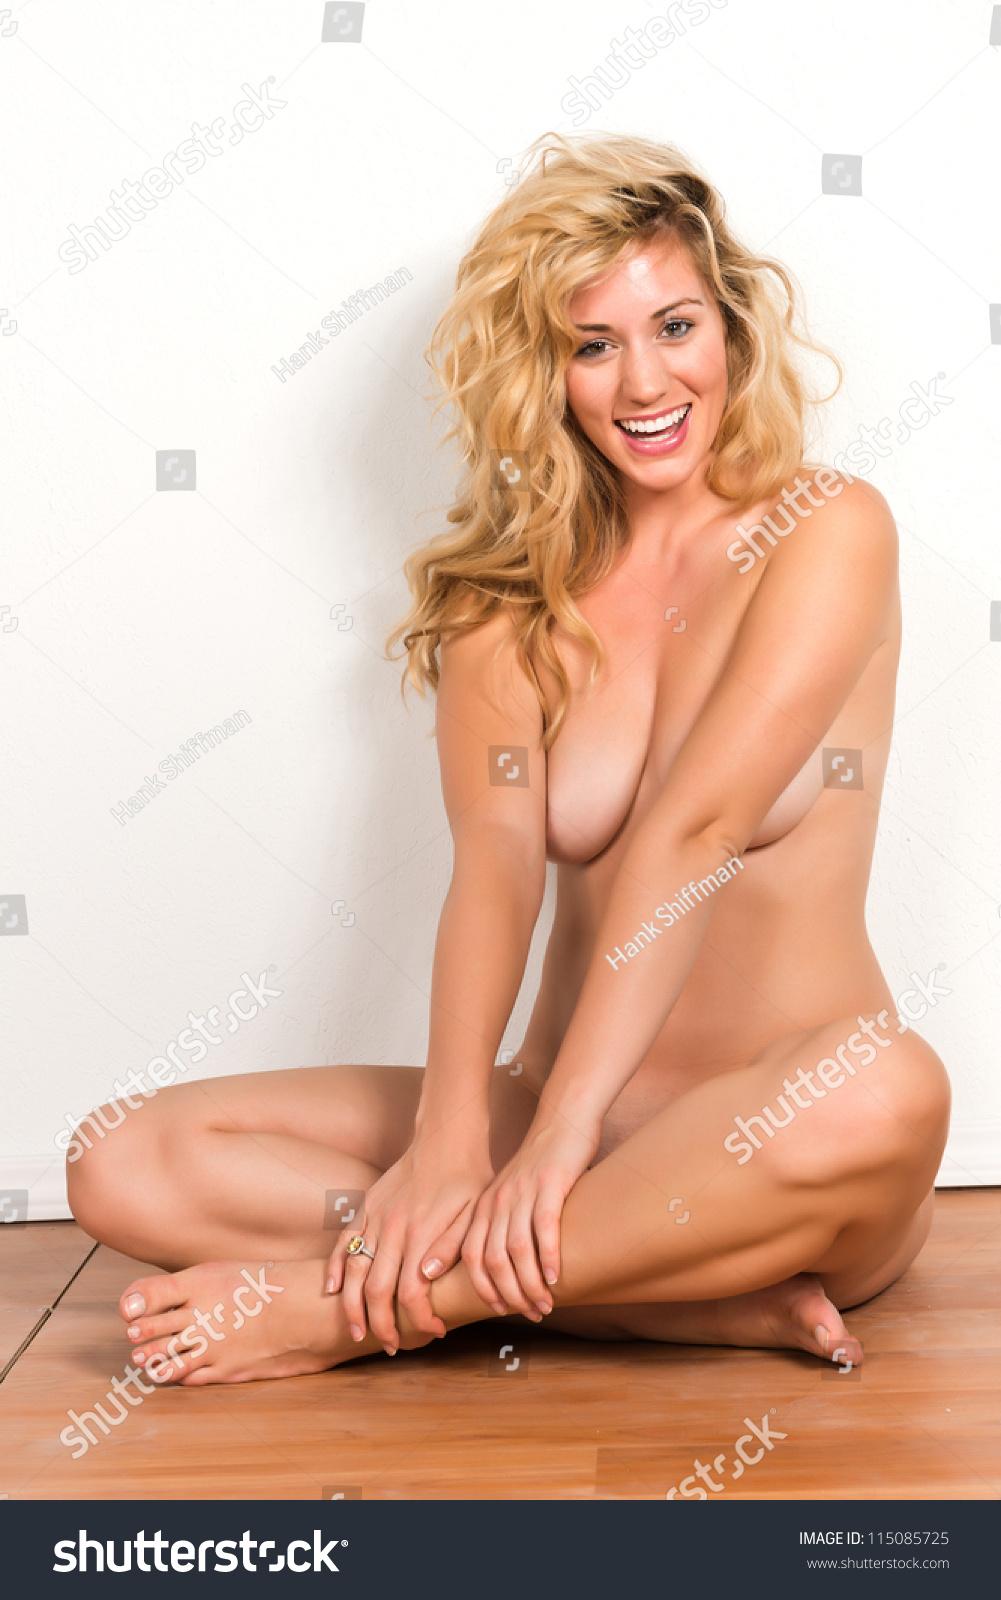 White blonde nude